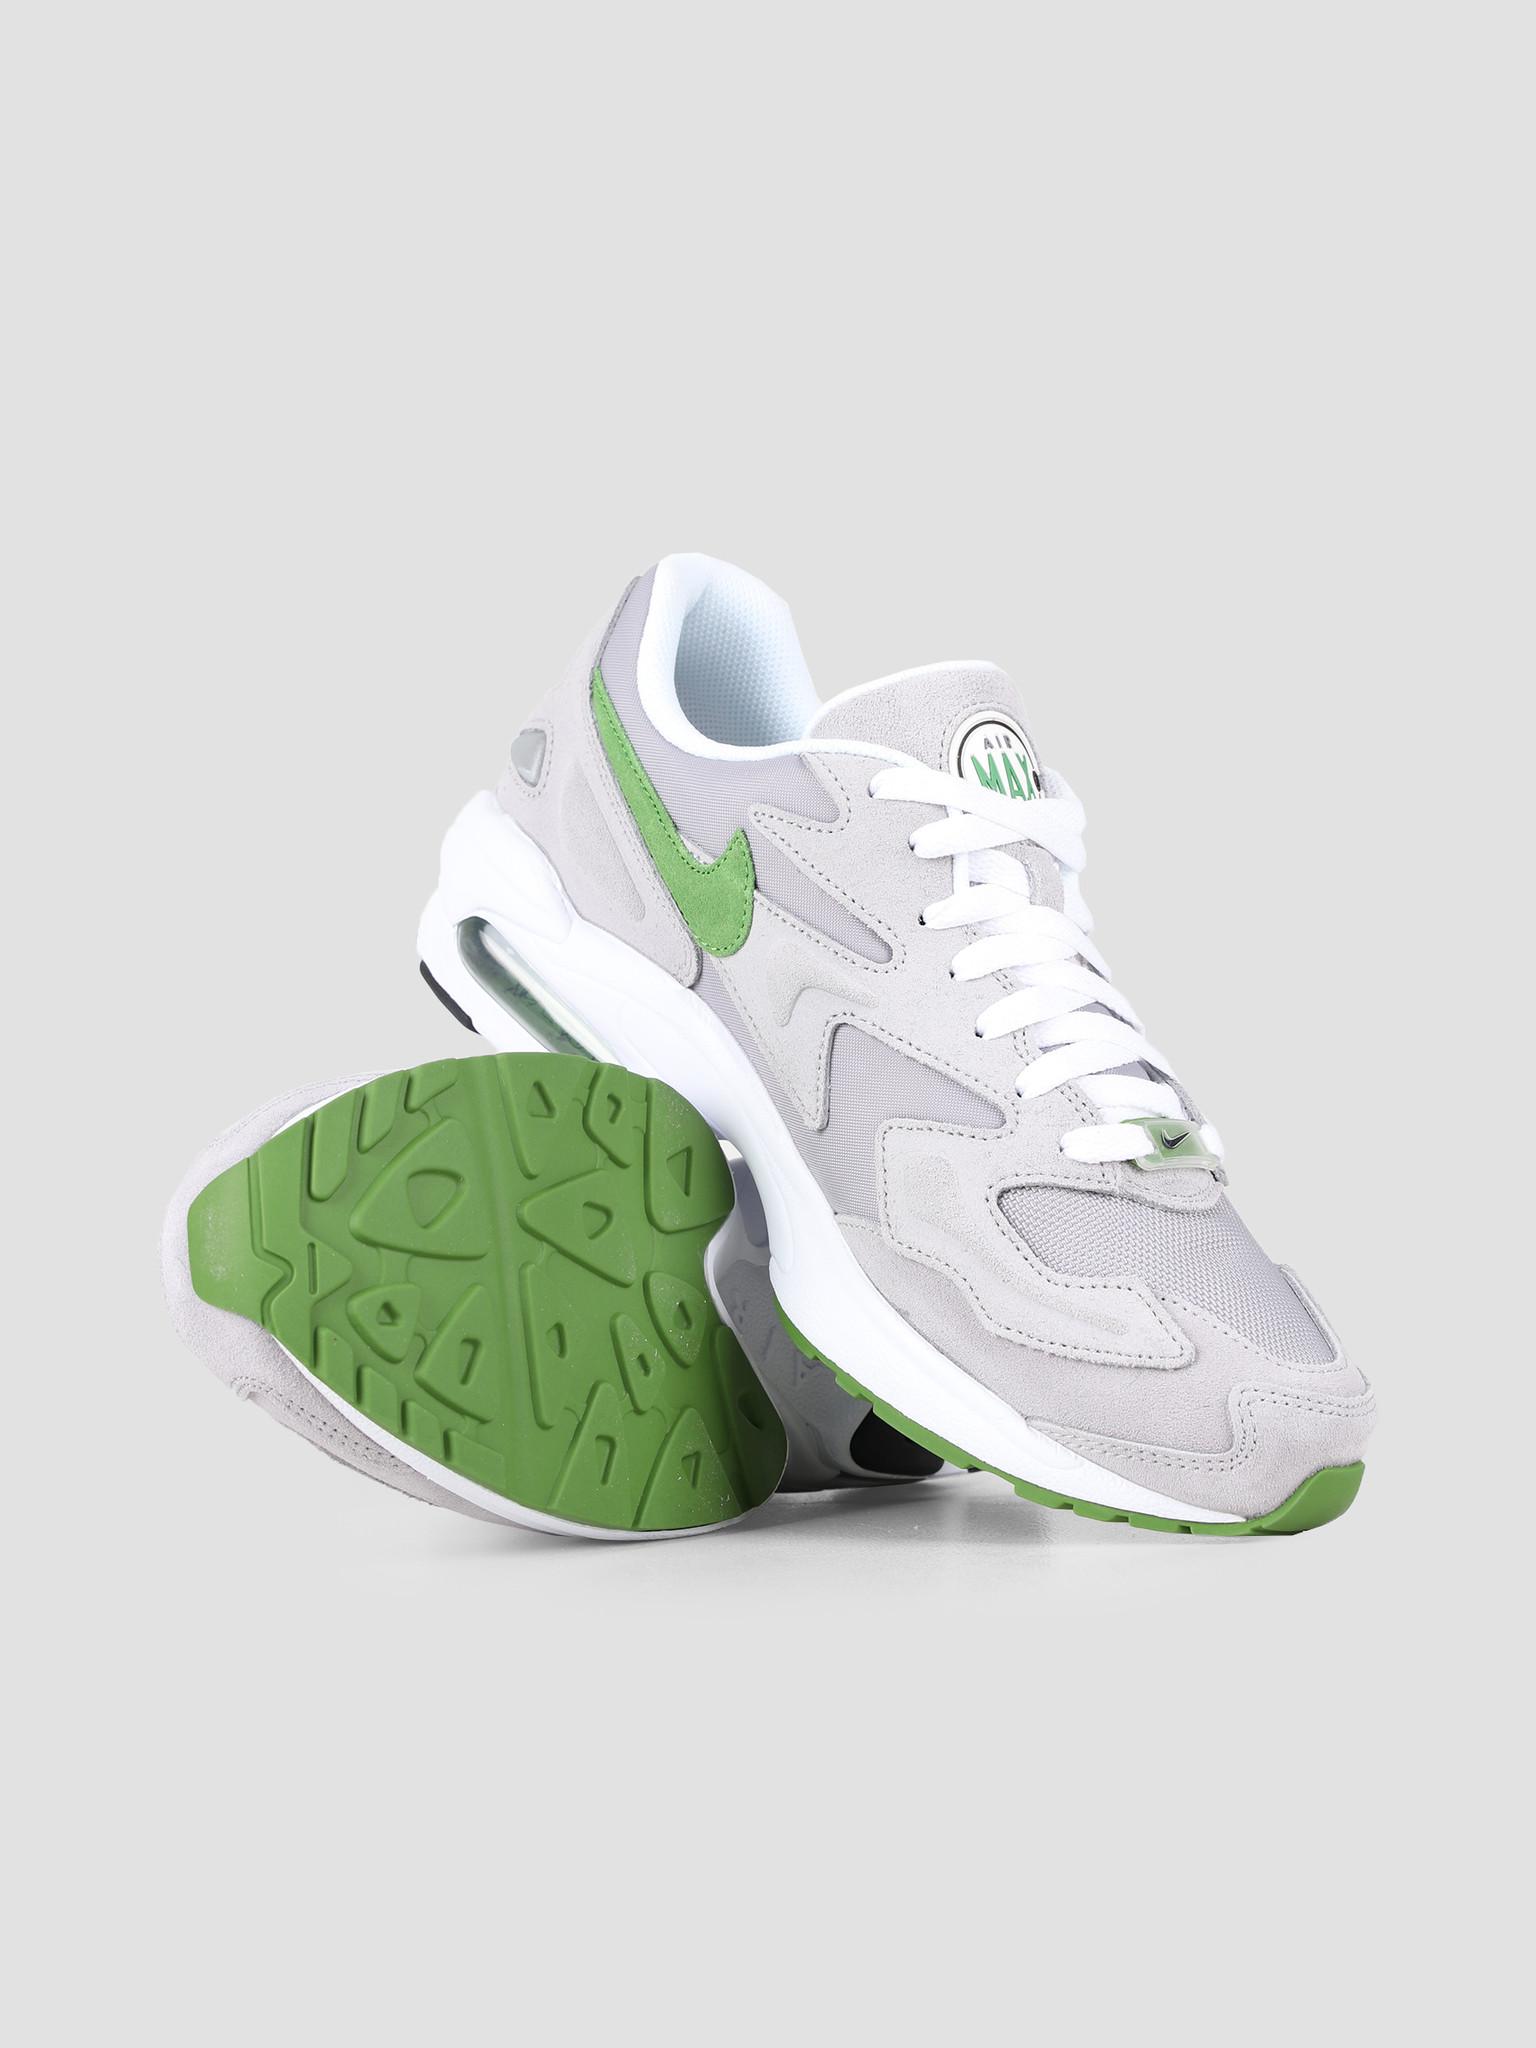 Nike Nike Air Max2 Light Lx Atmosphere Grey Gunsmoke Chlorophyll CI1672-001